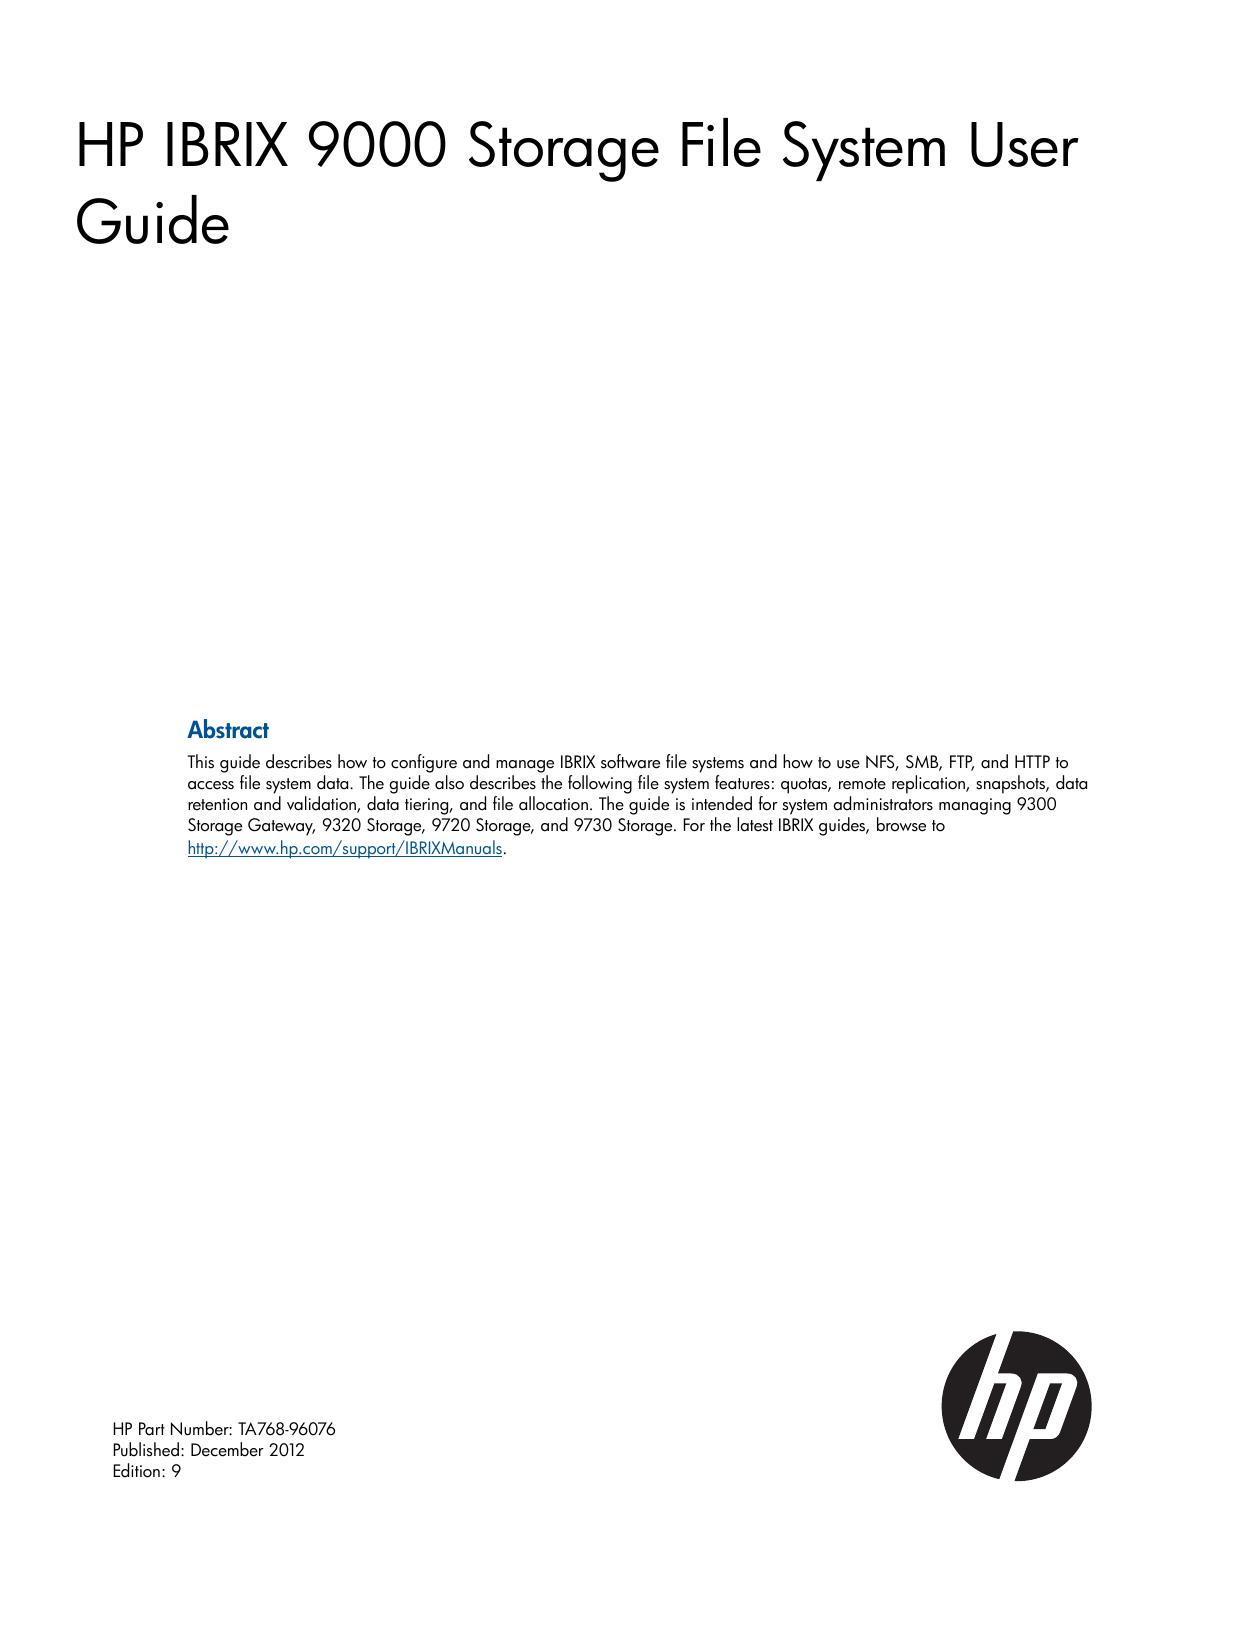 HP IBRIX 9000 Storage File System User Guide | manualzz com